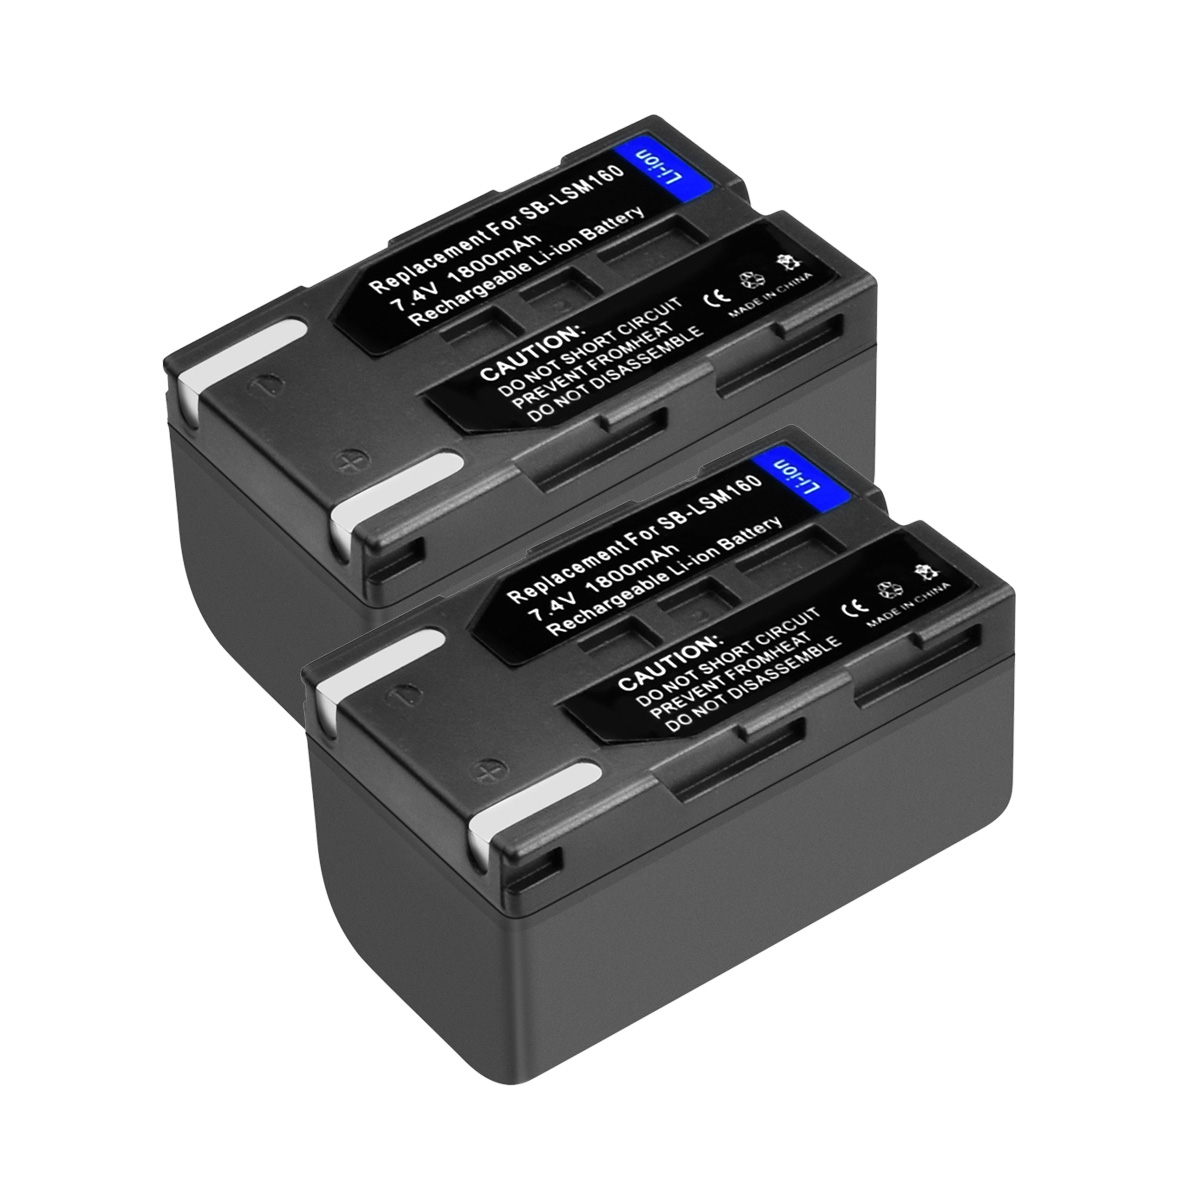 2Packs 7.4V 1800mAh SB LSM160 SB LSM160 SBLSM160 Camera